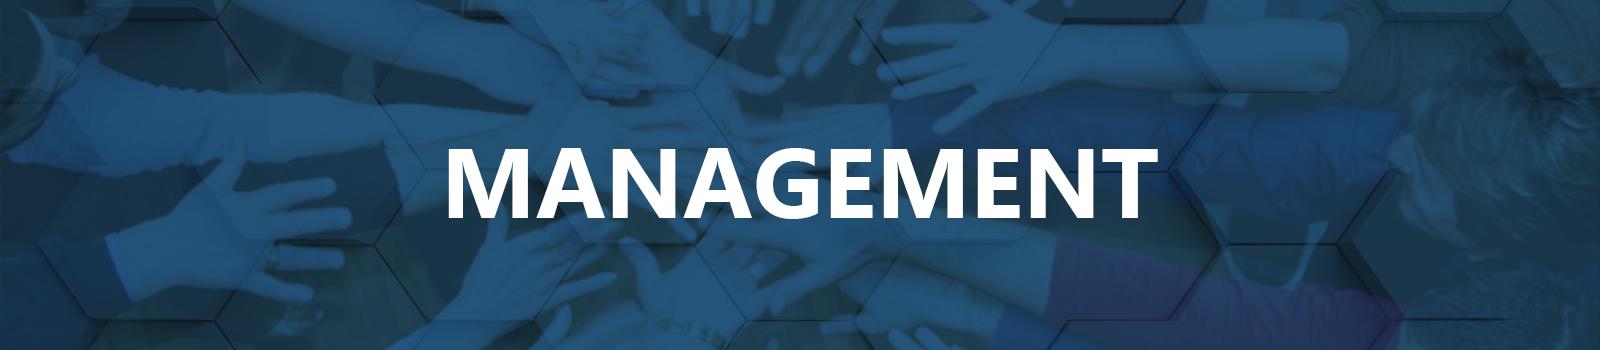 Management Banner-1